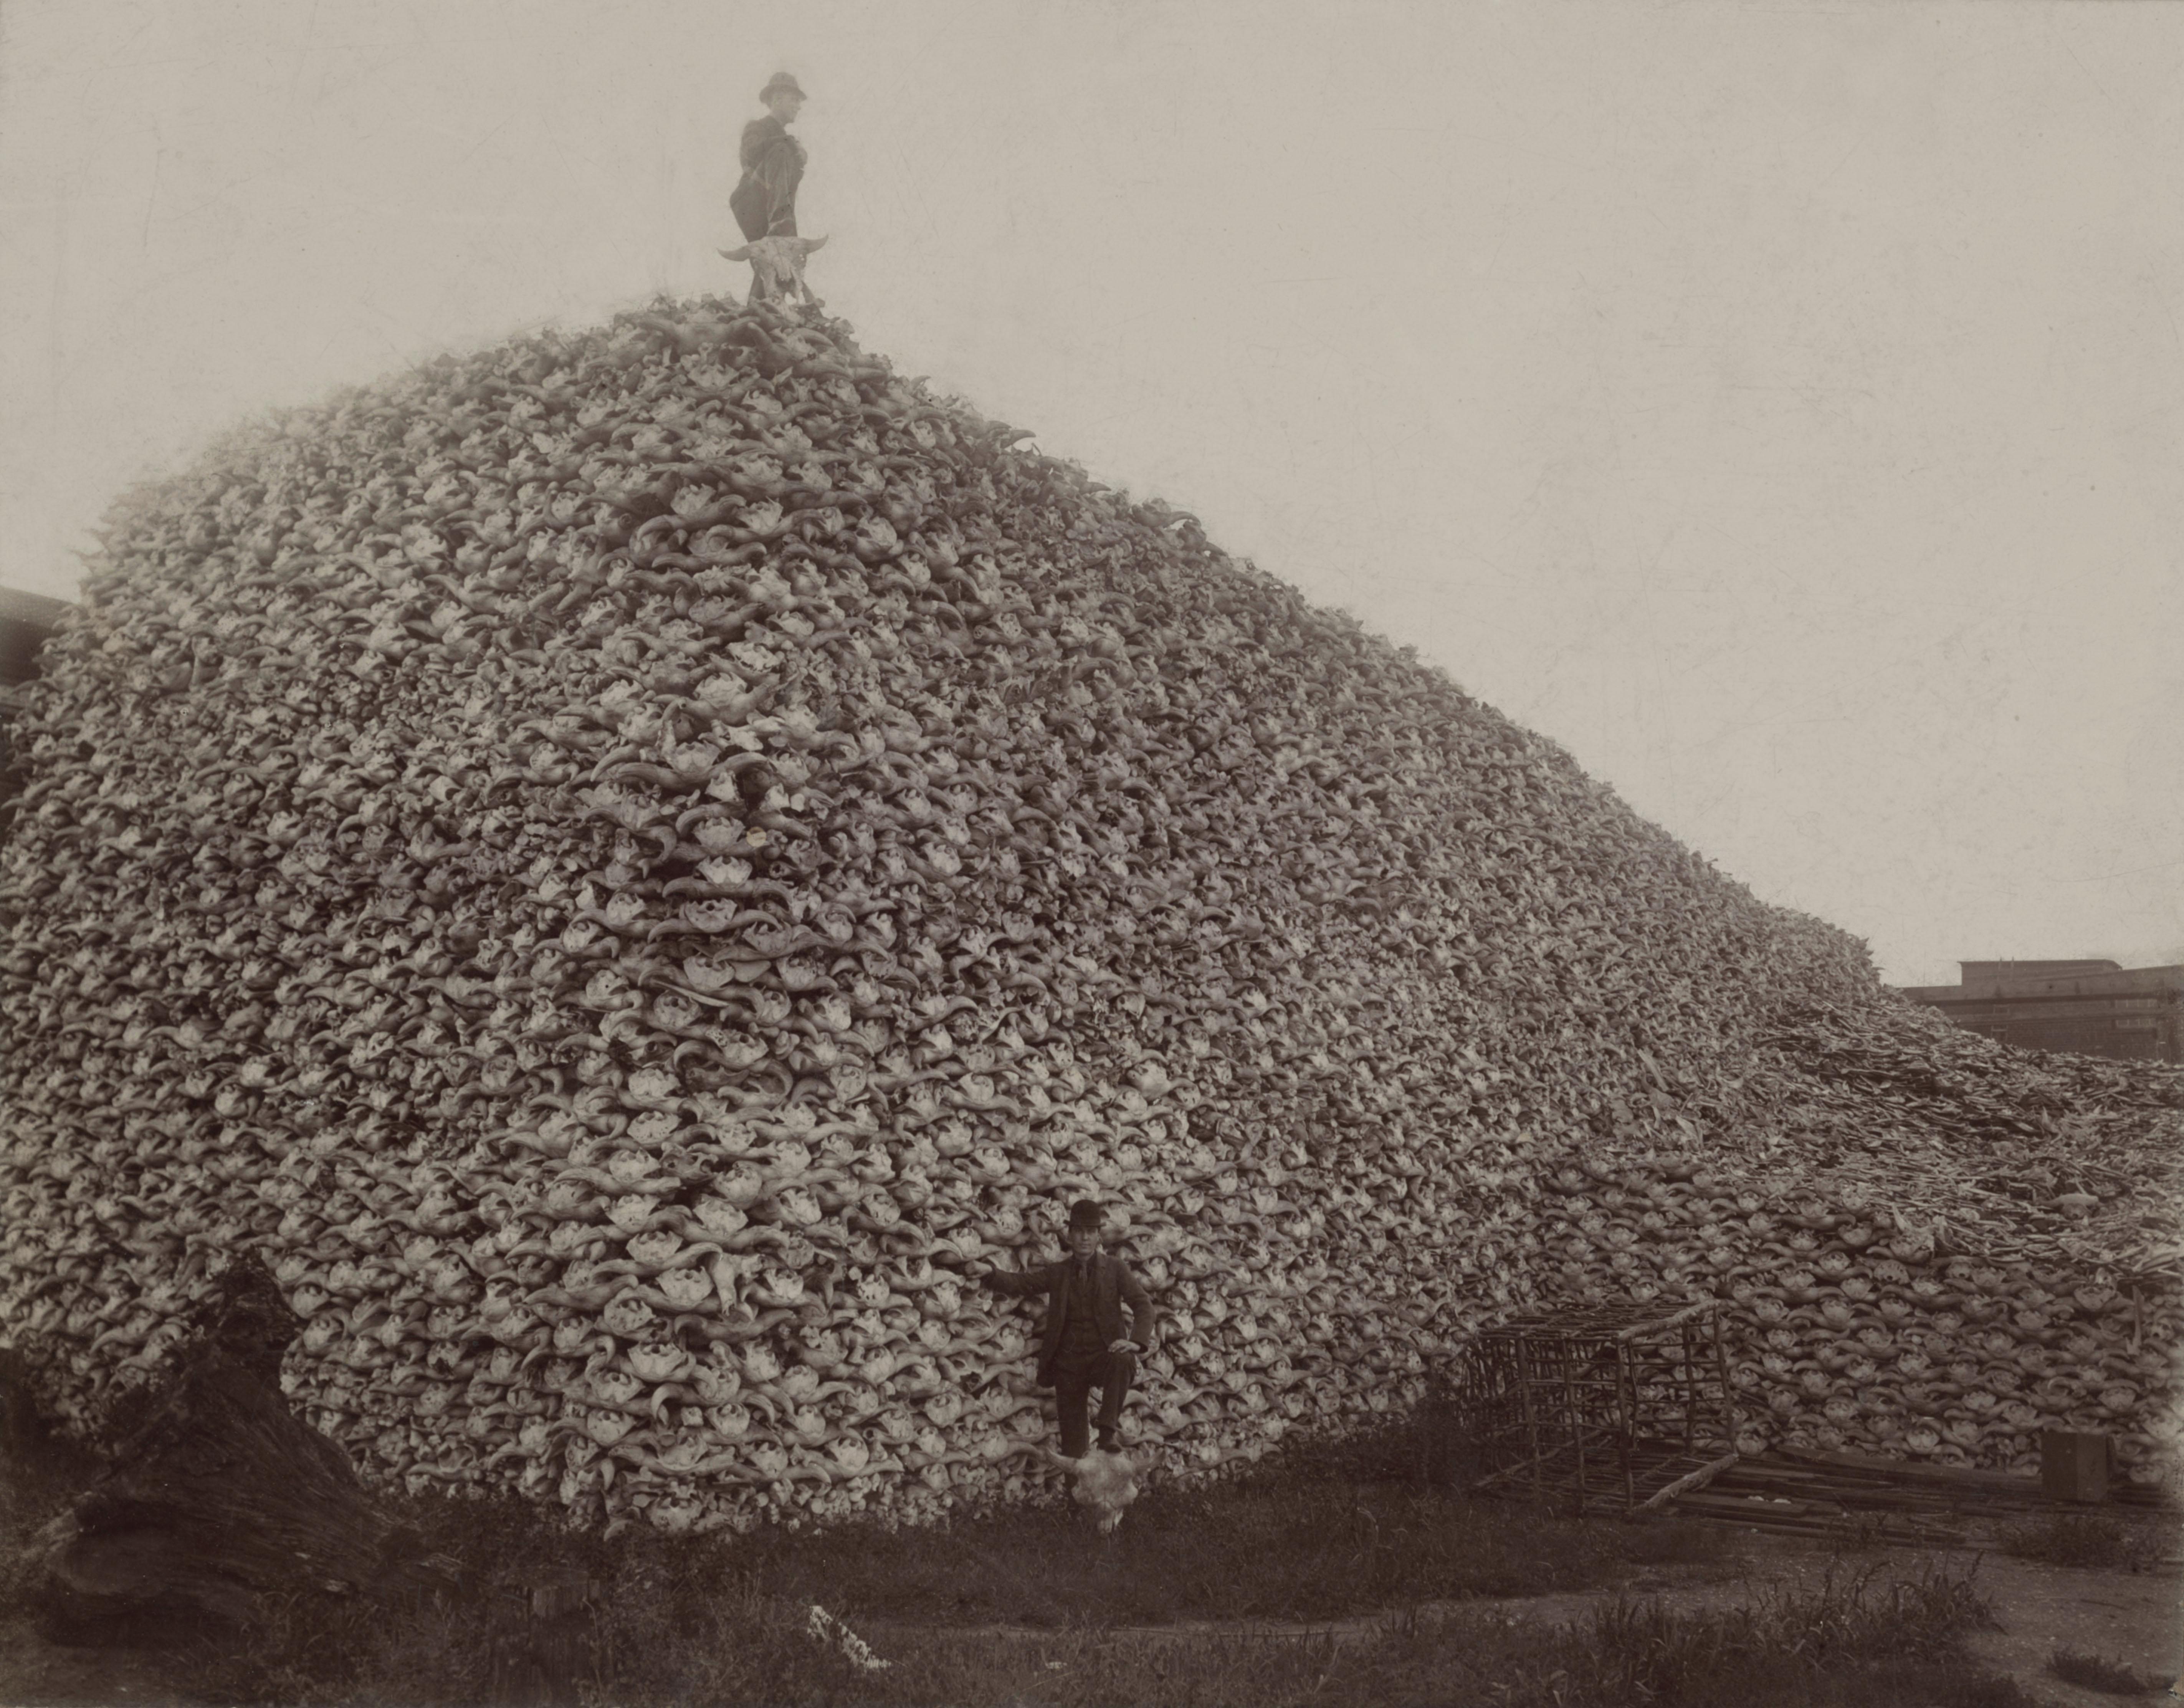 Buffalo Skulls Pile